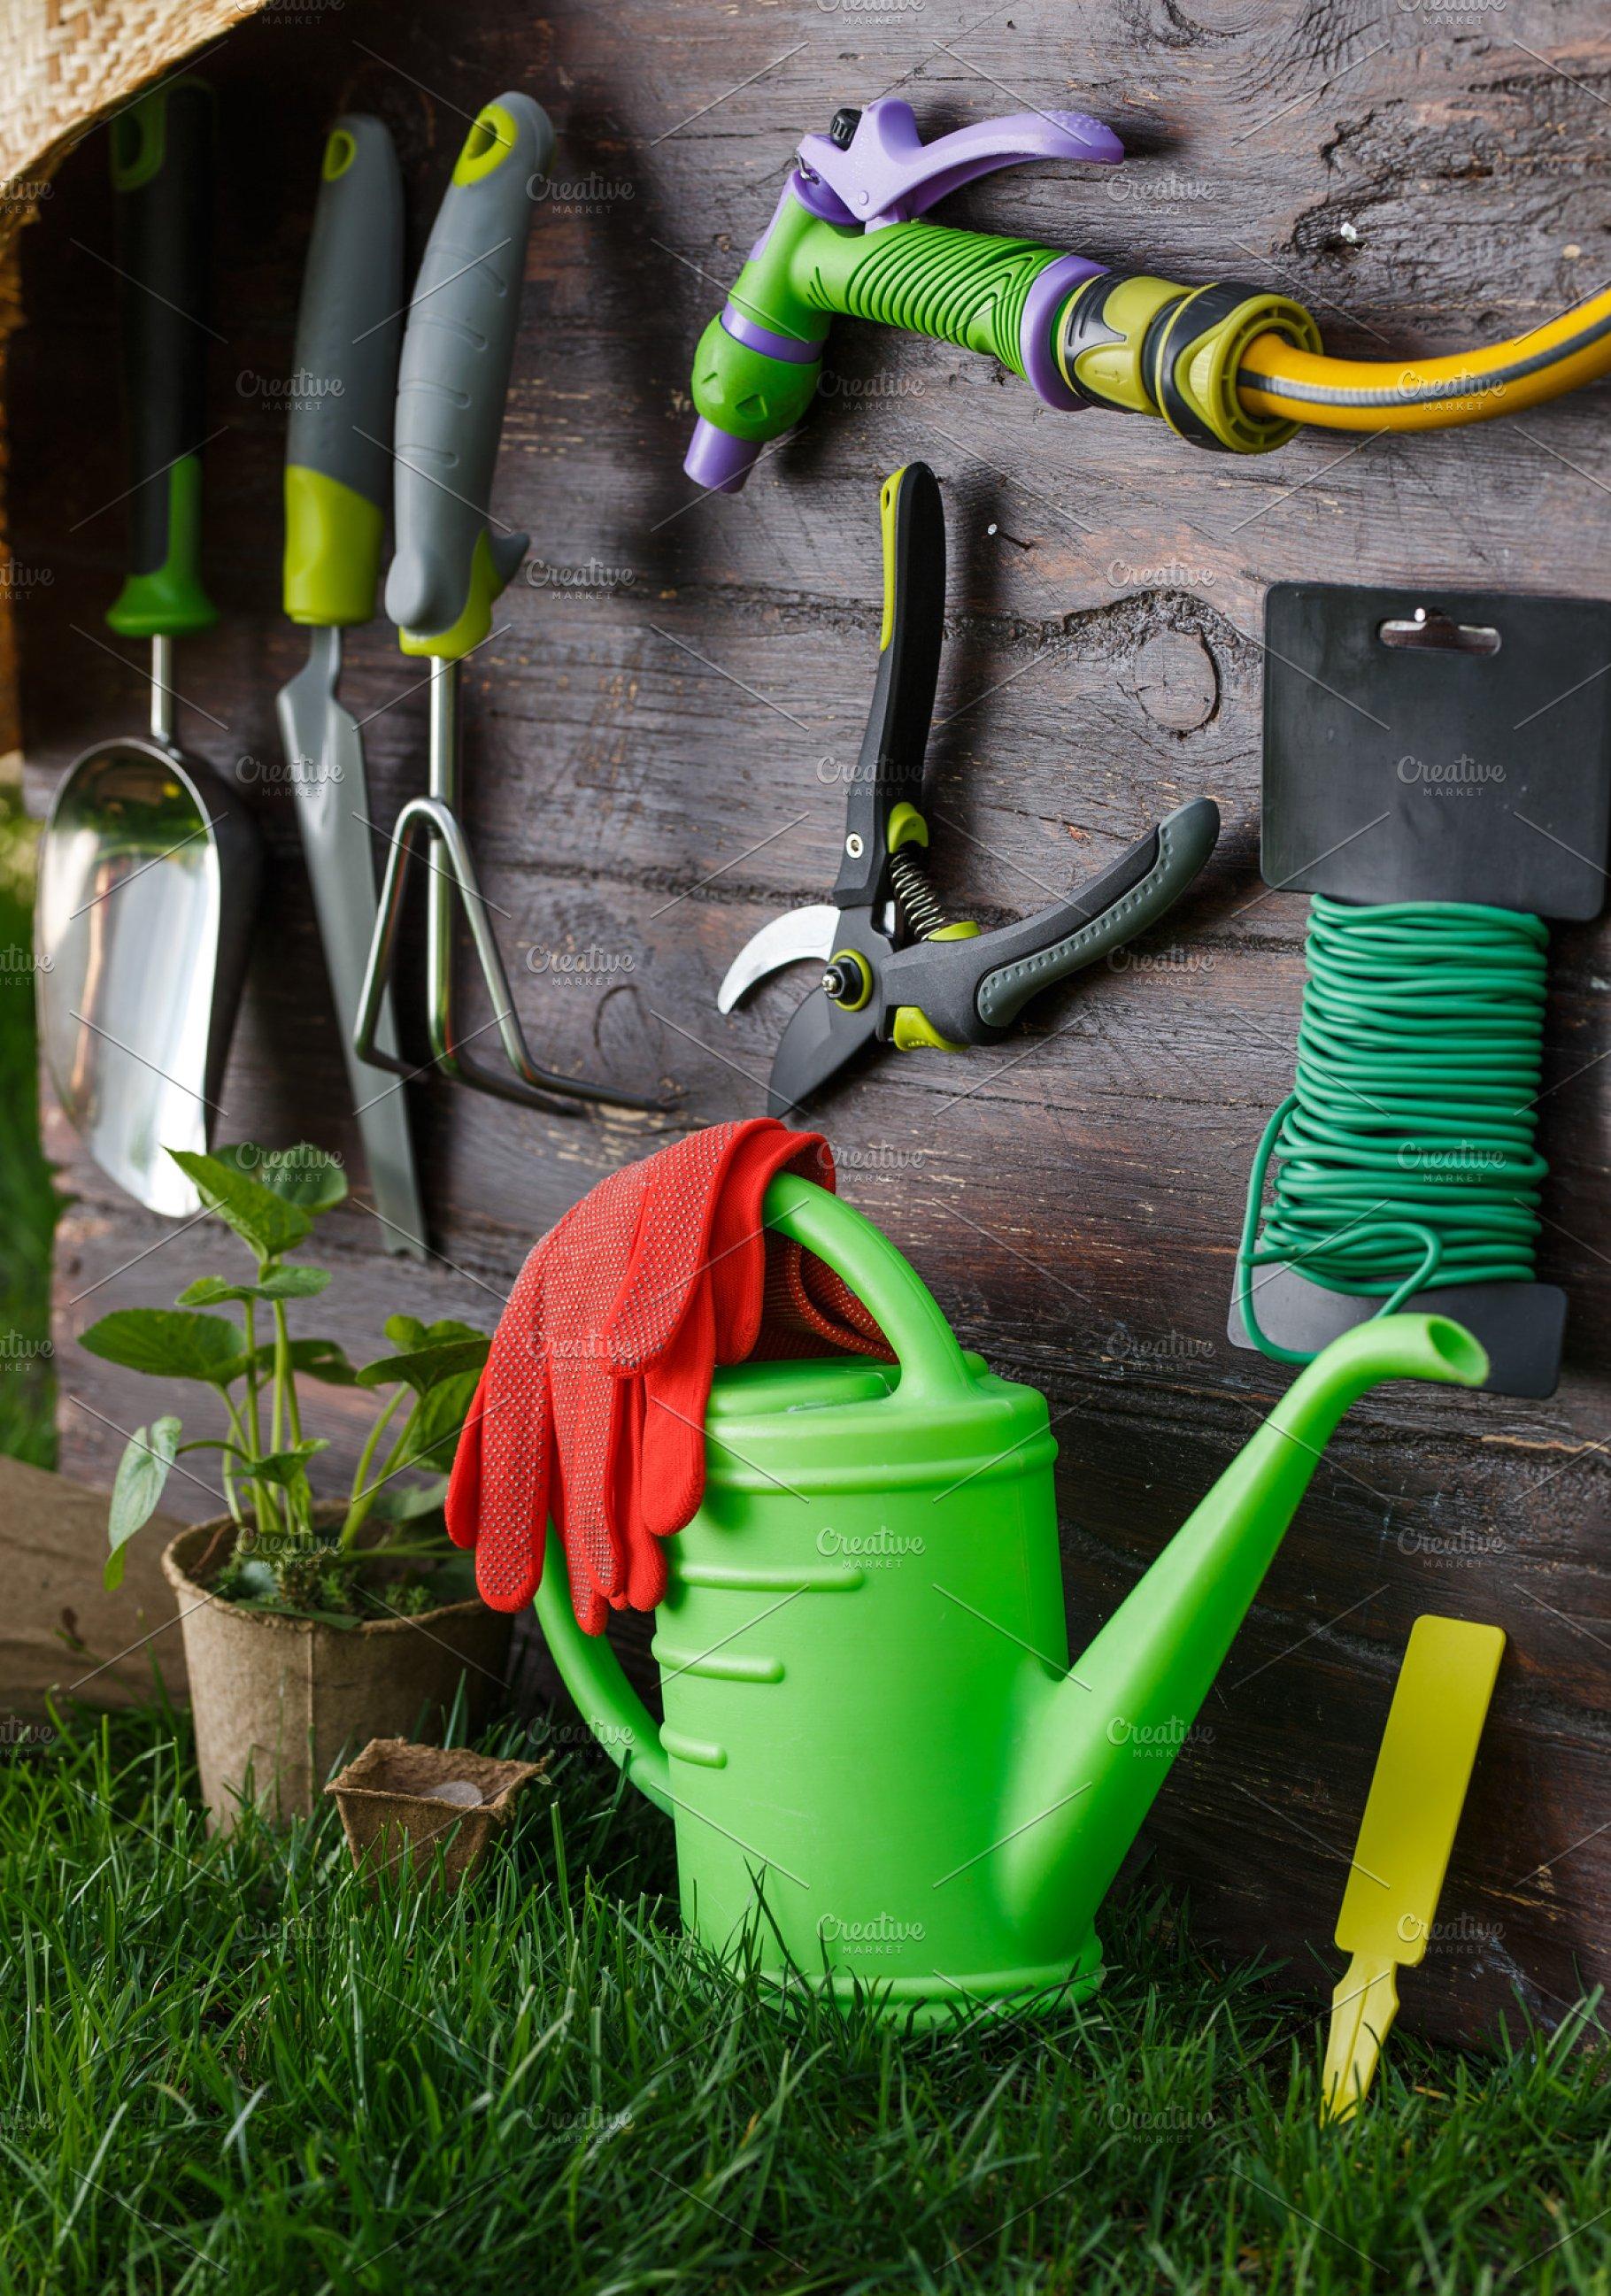 Gardening Tools And Equipment Closeup In The Backyard High